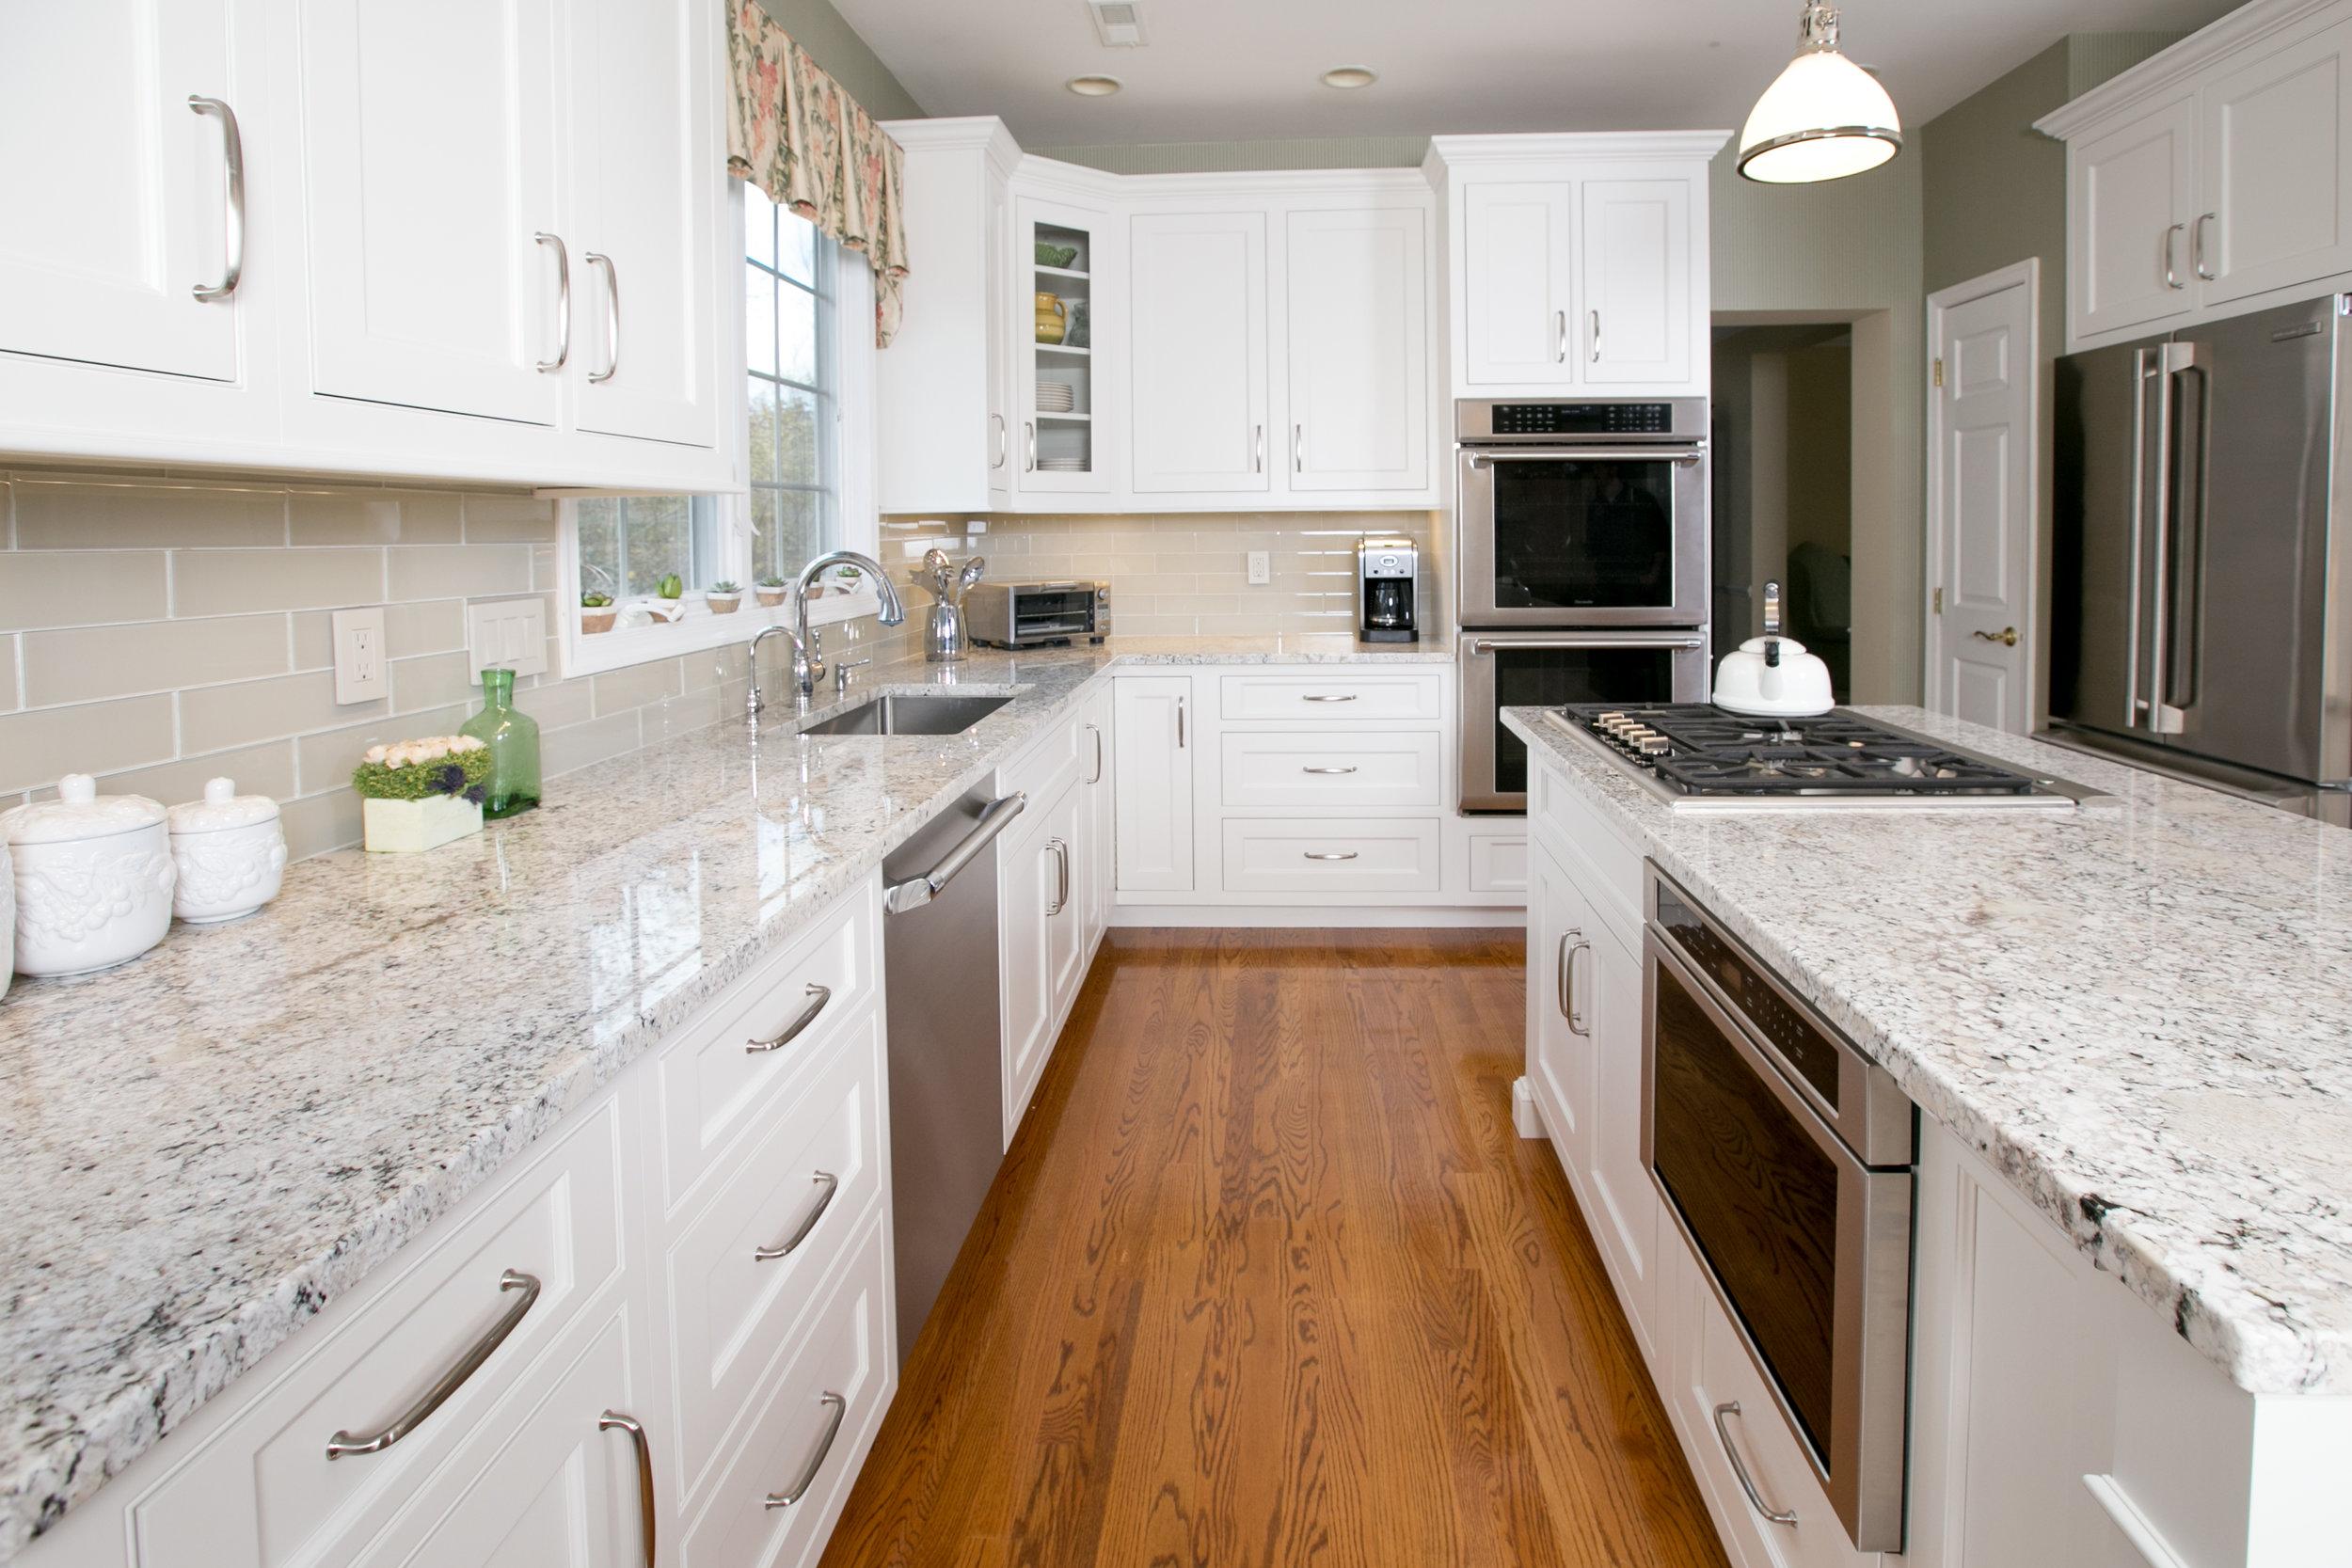 White Kitchen Island Drawer Microwave - Ackley Cabinet.jpg